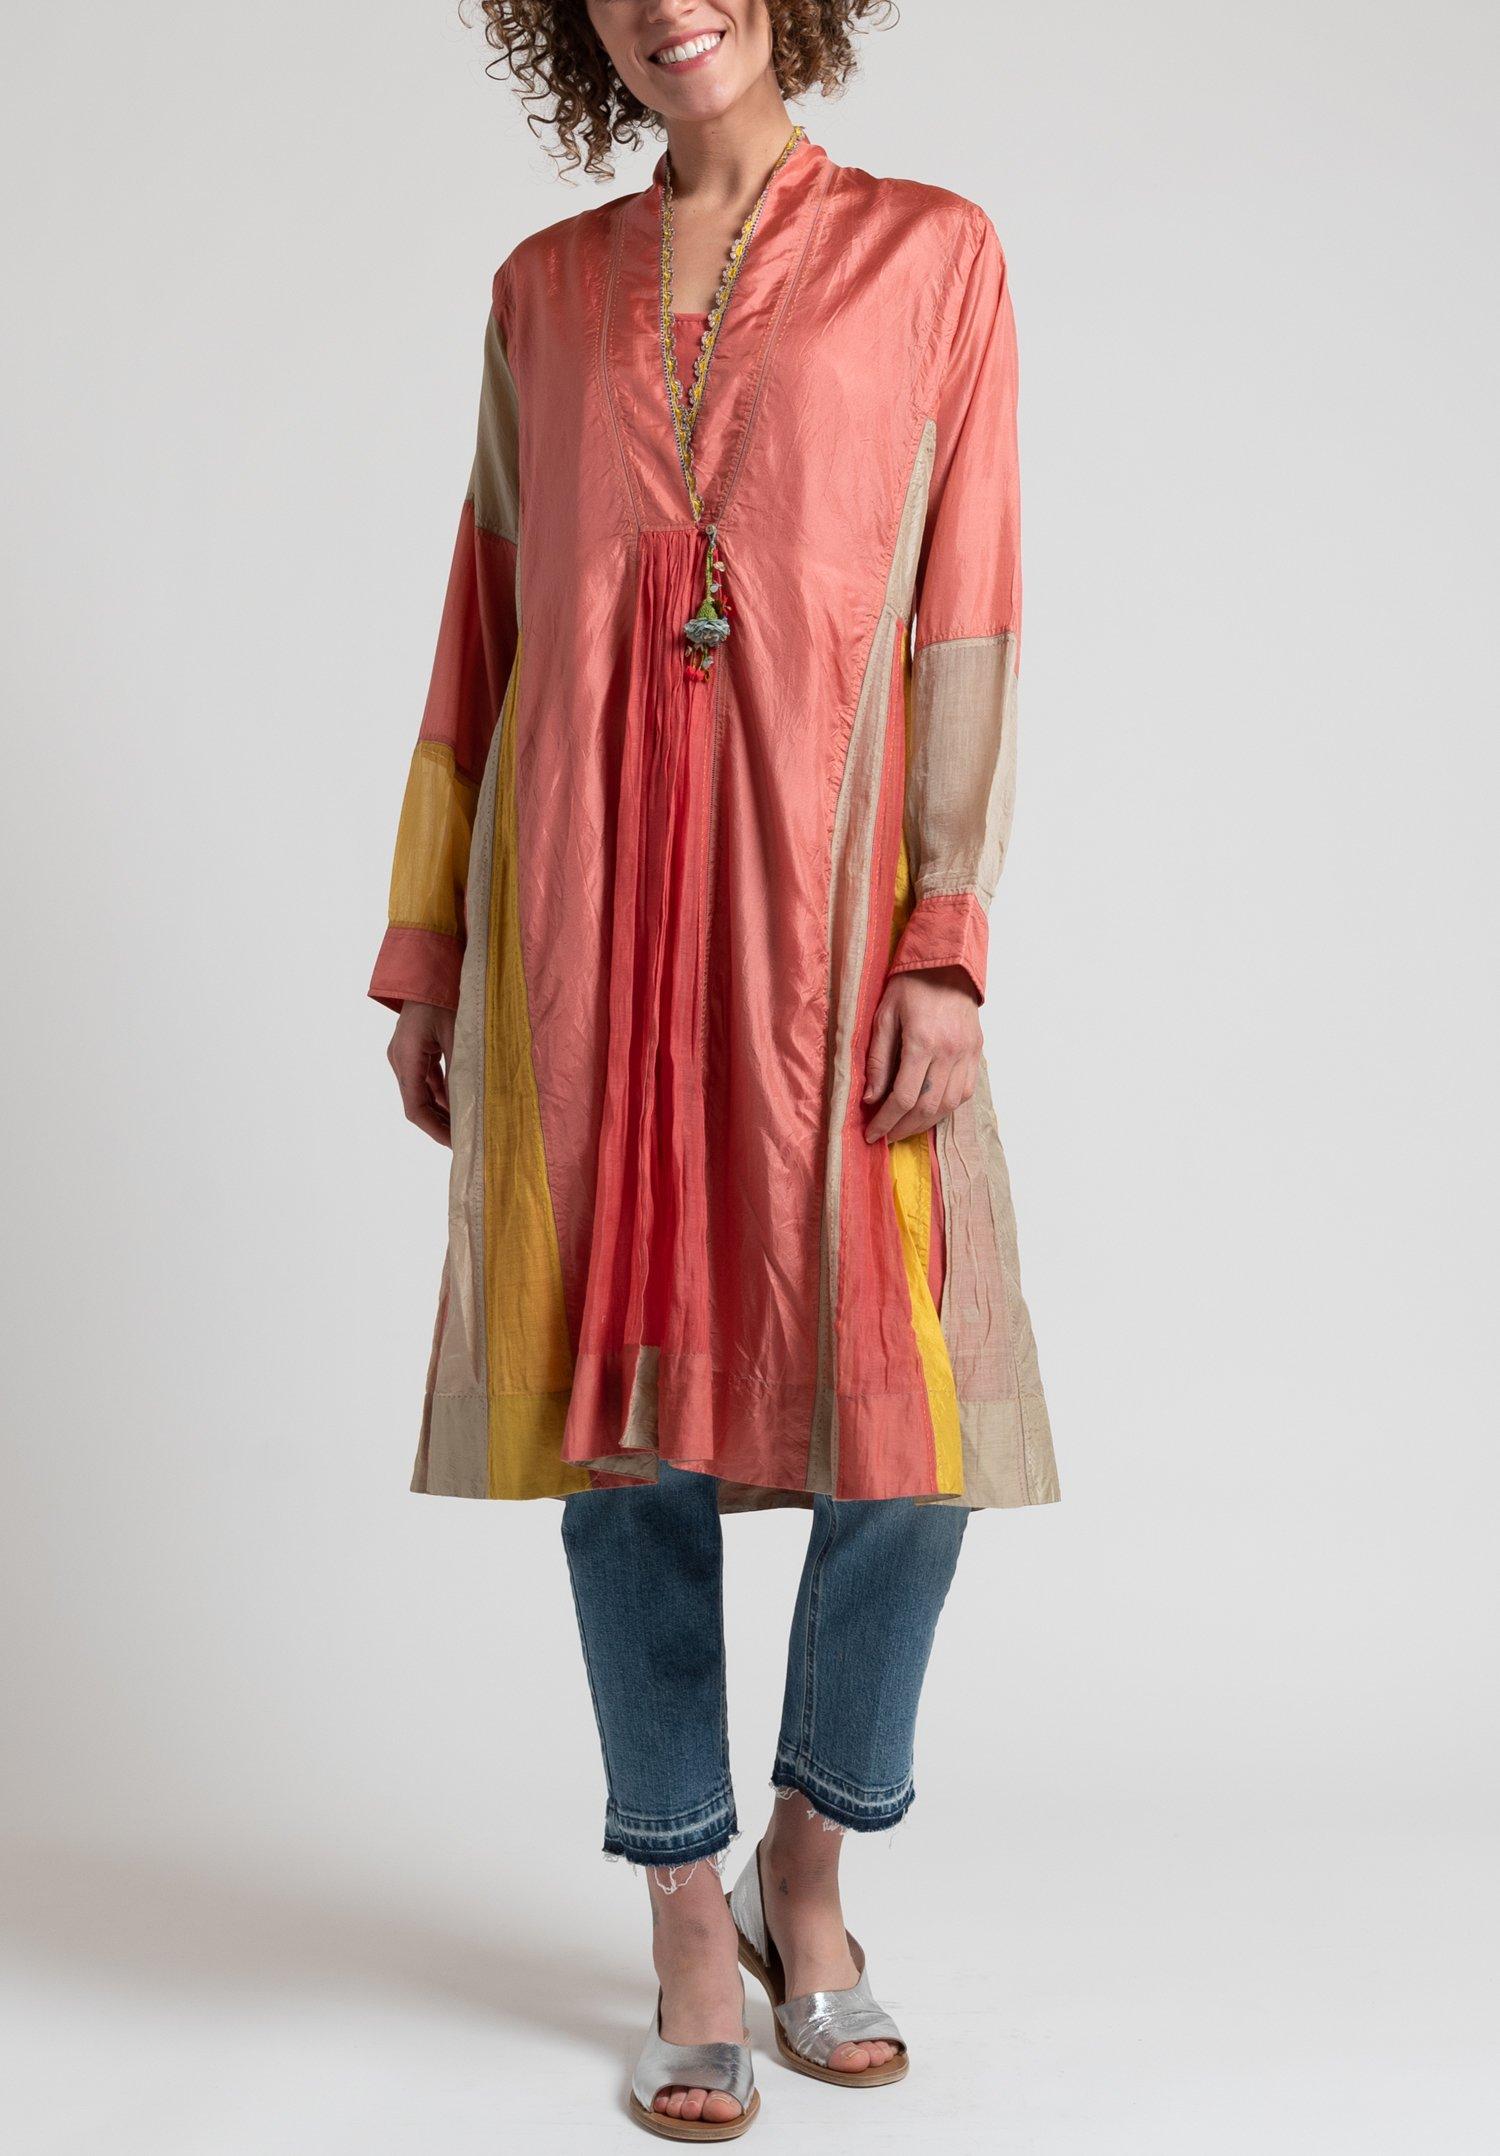 P 233 Ro Silk Amp Cotton Dress In Pink Santa Fe Dry Goods